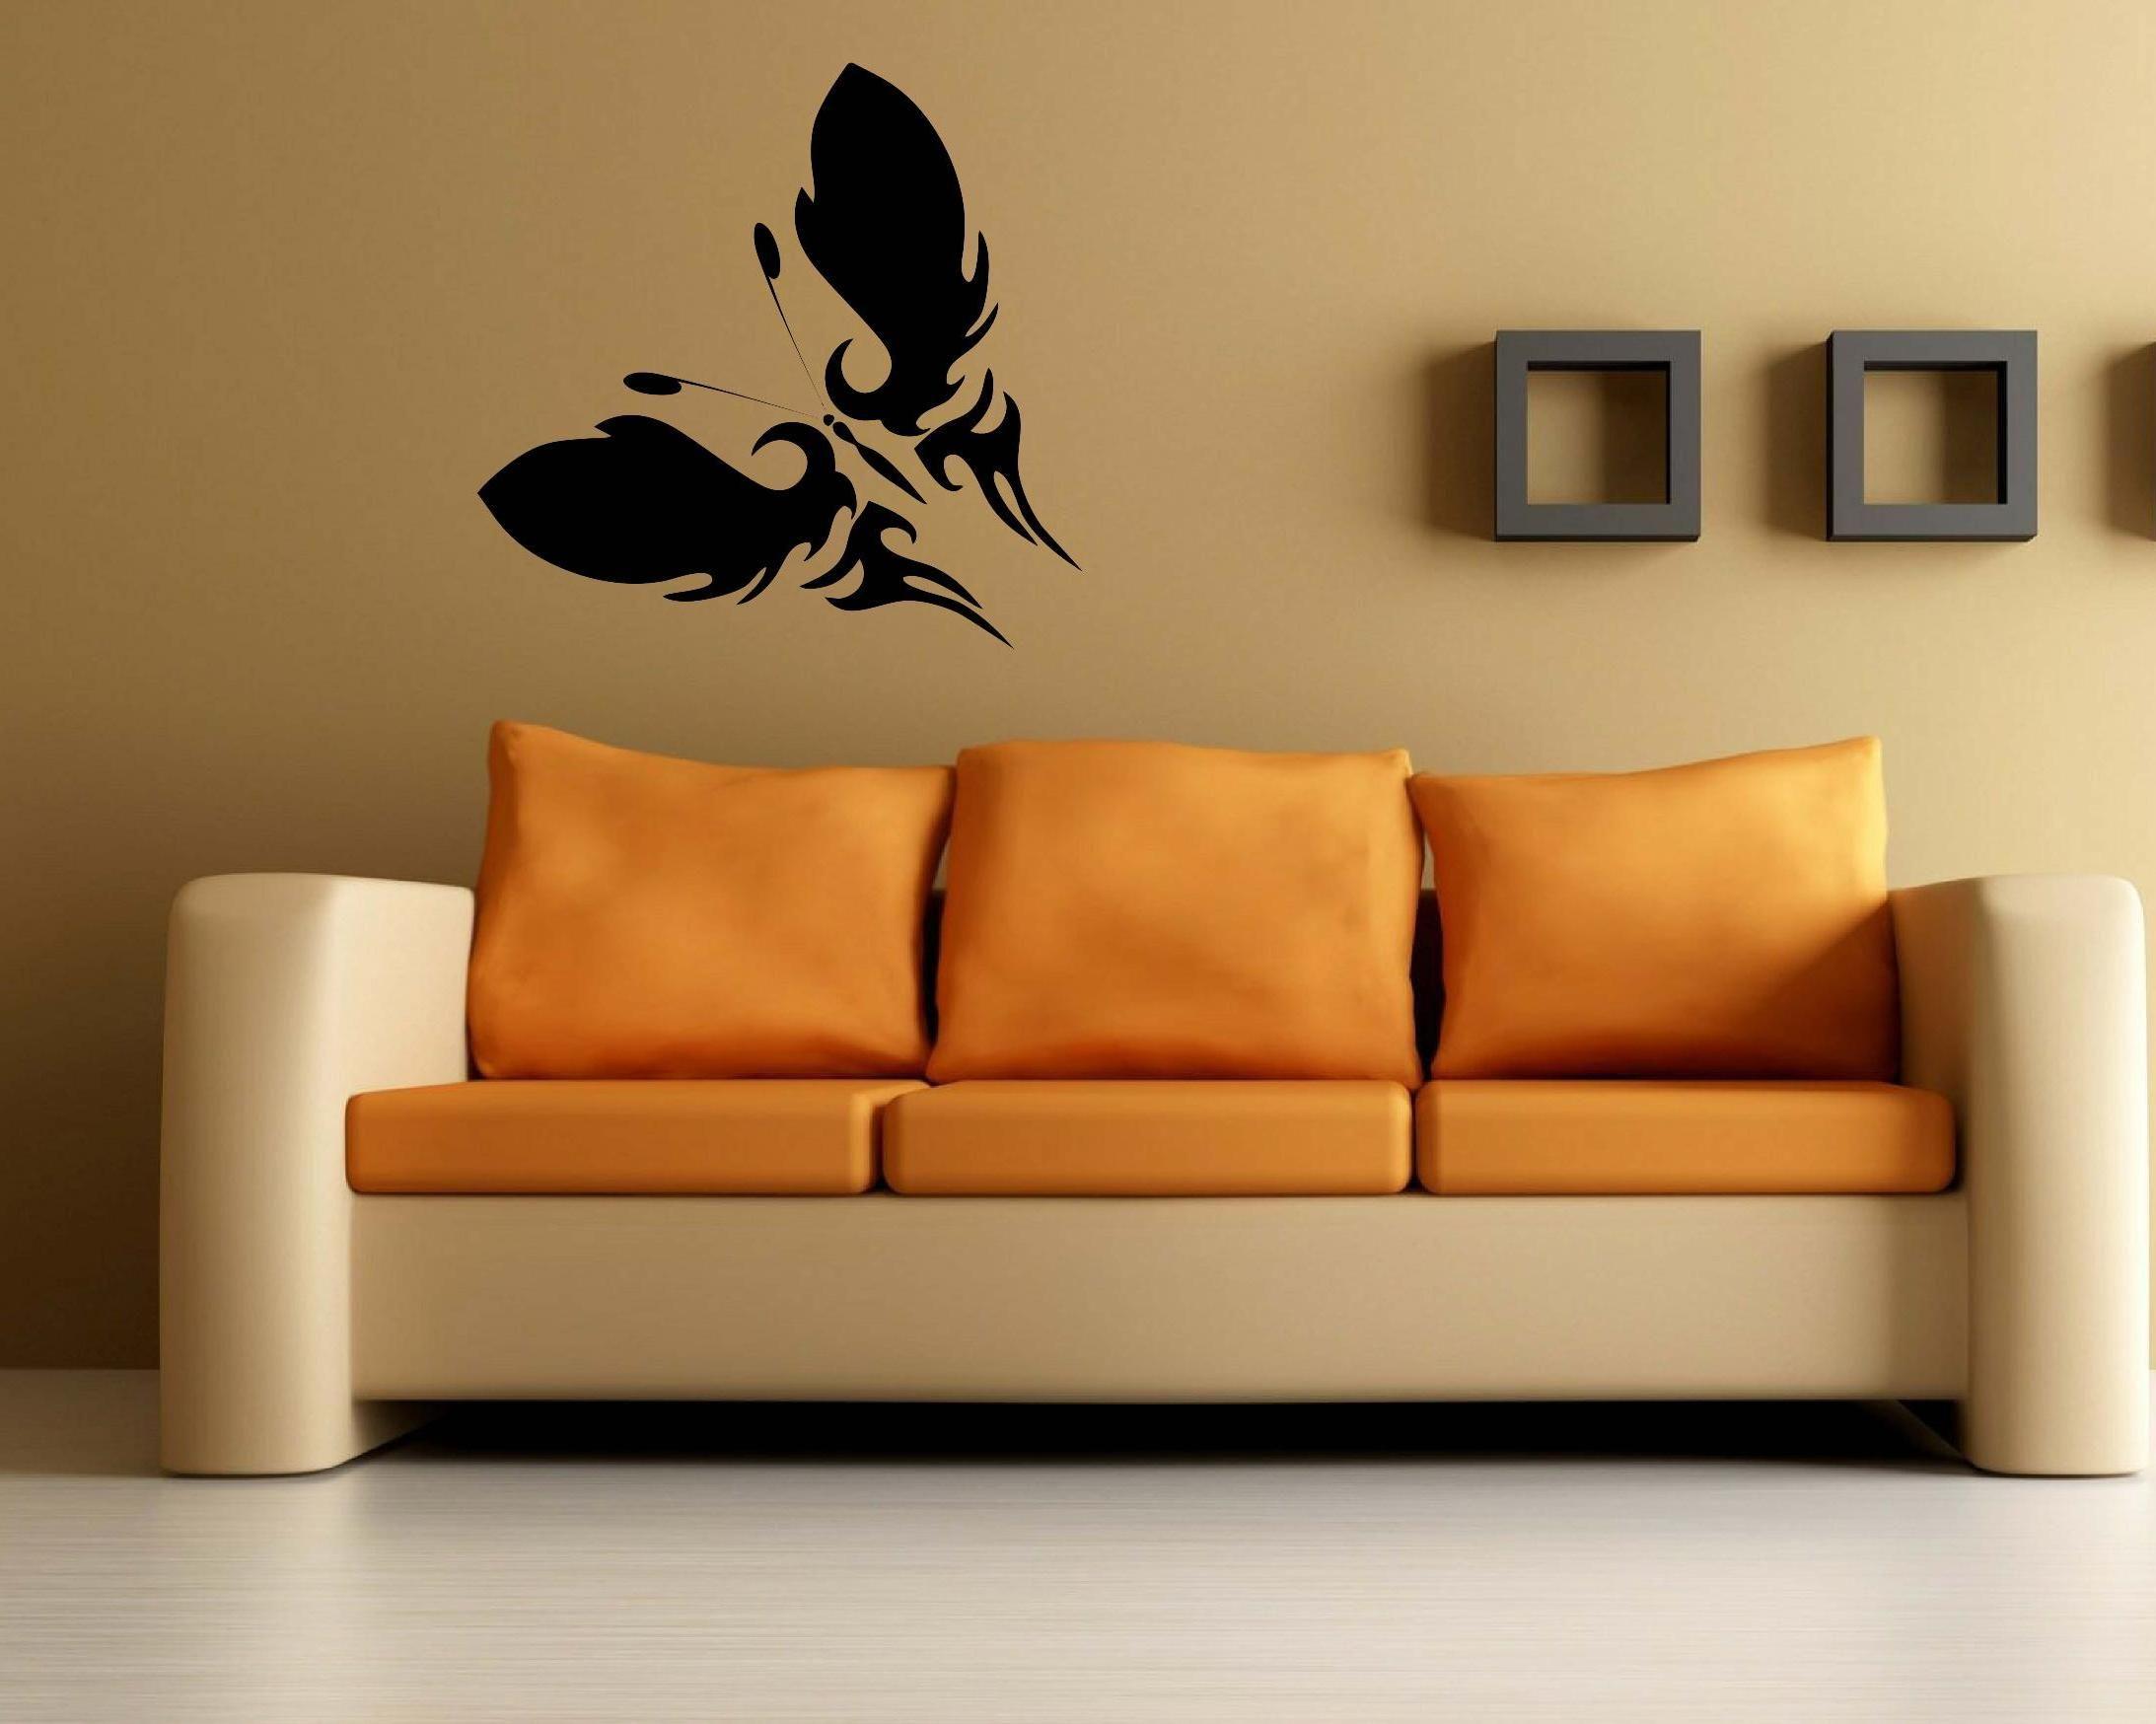 Black Single Large Butterfly Wall Decal Wall Decal Australia - Custom vinyl decals australia